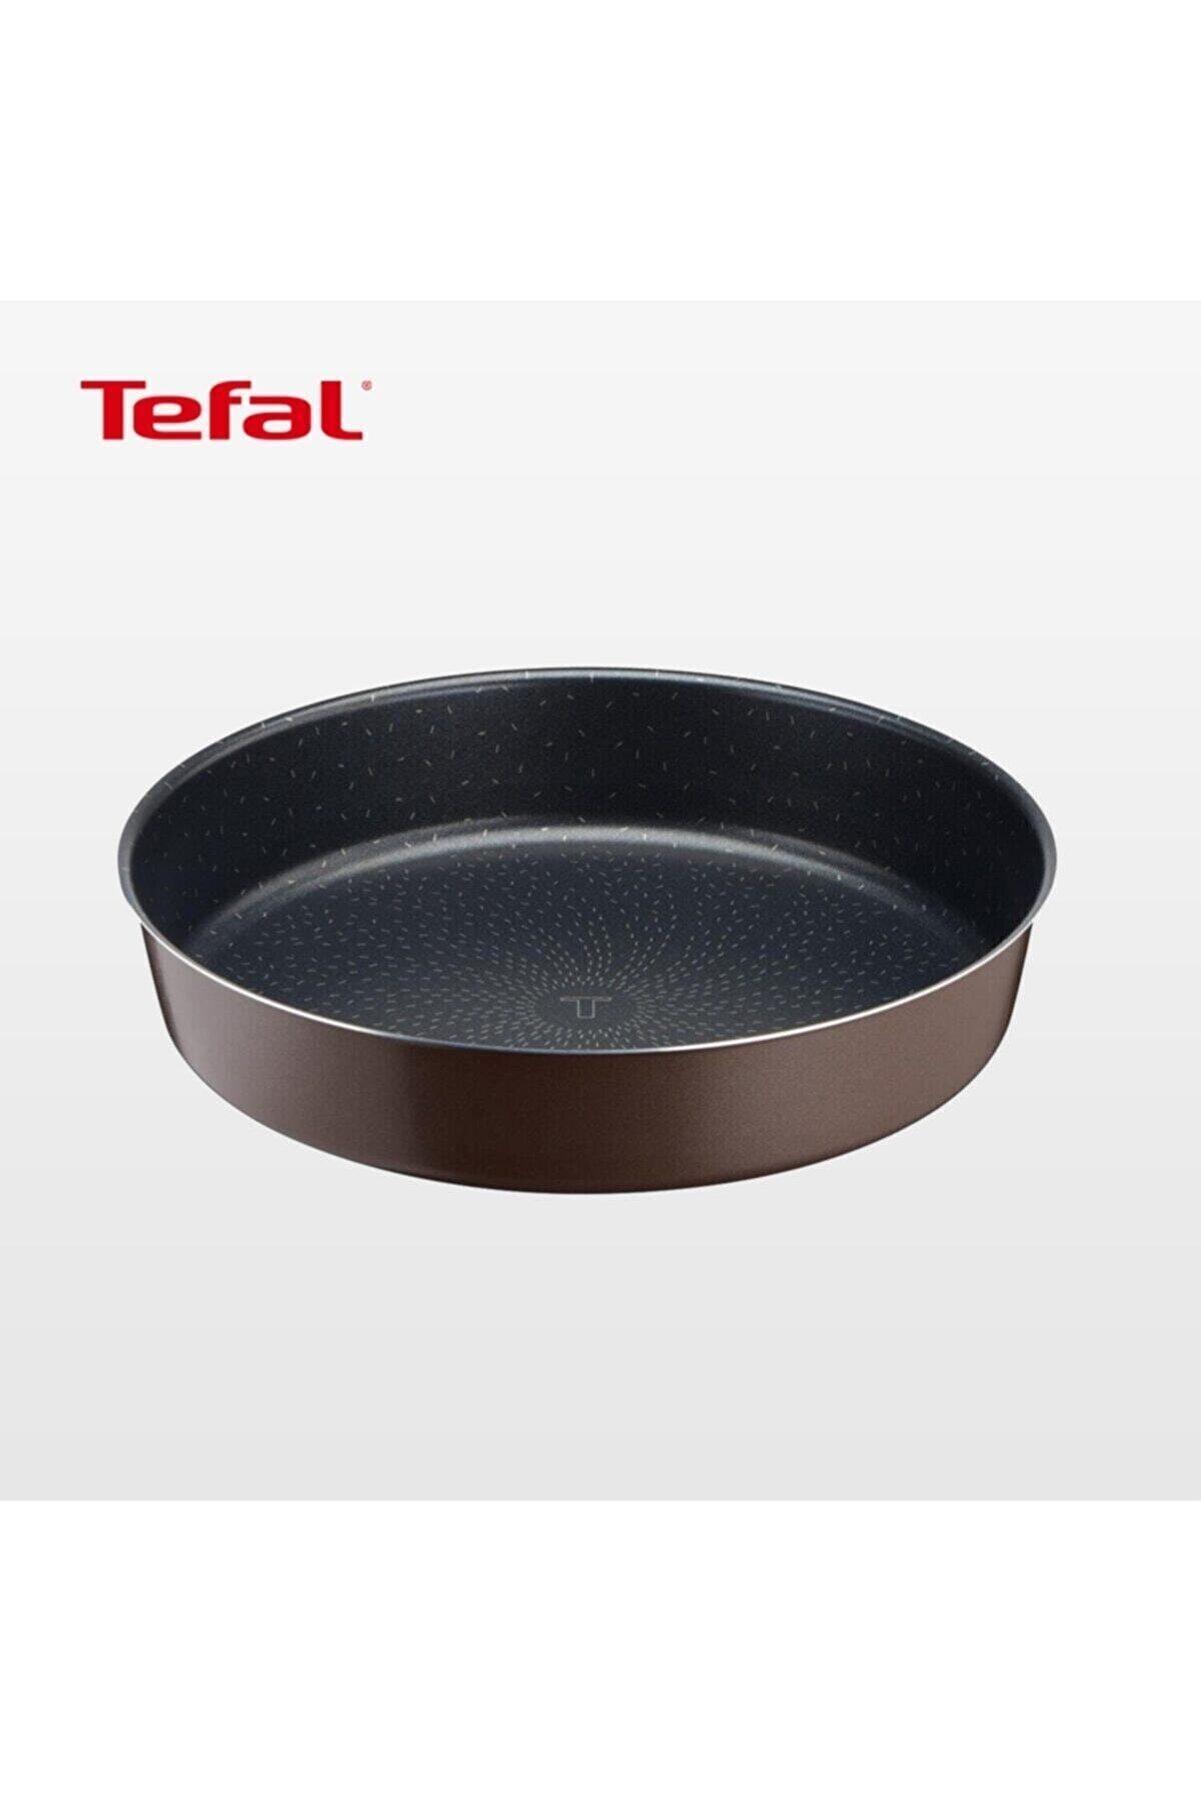 TEFAL J5549702 Perfect Bake 26 Cm Yuvarlak Fırın Kabı - 2100111151 28bgck